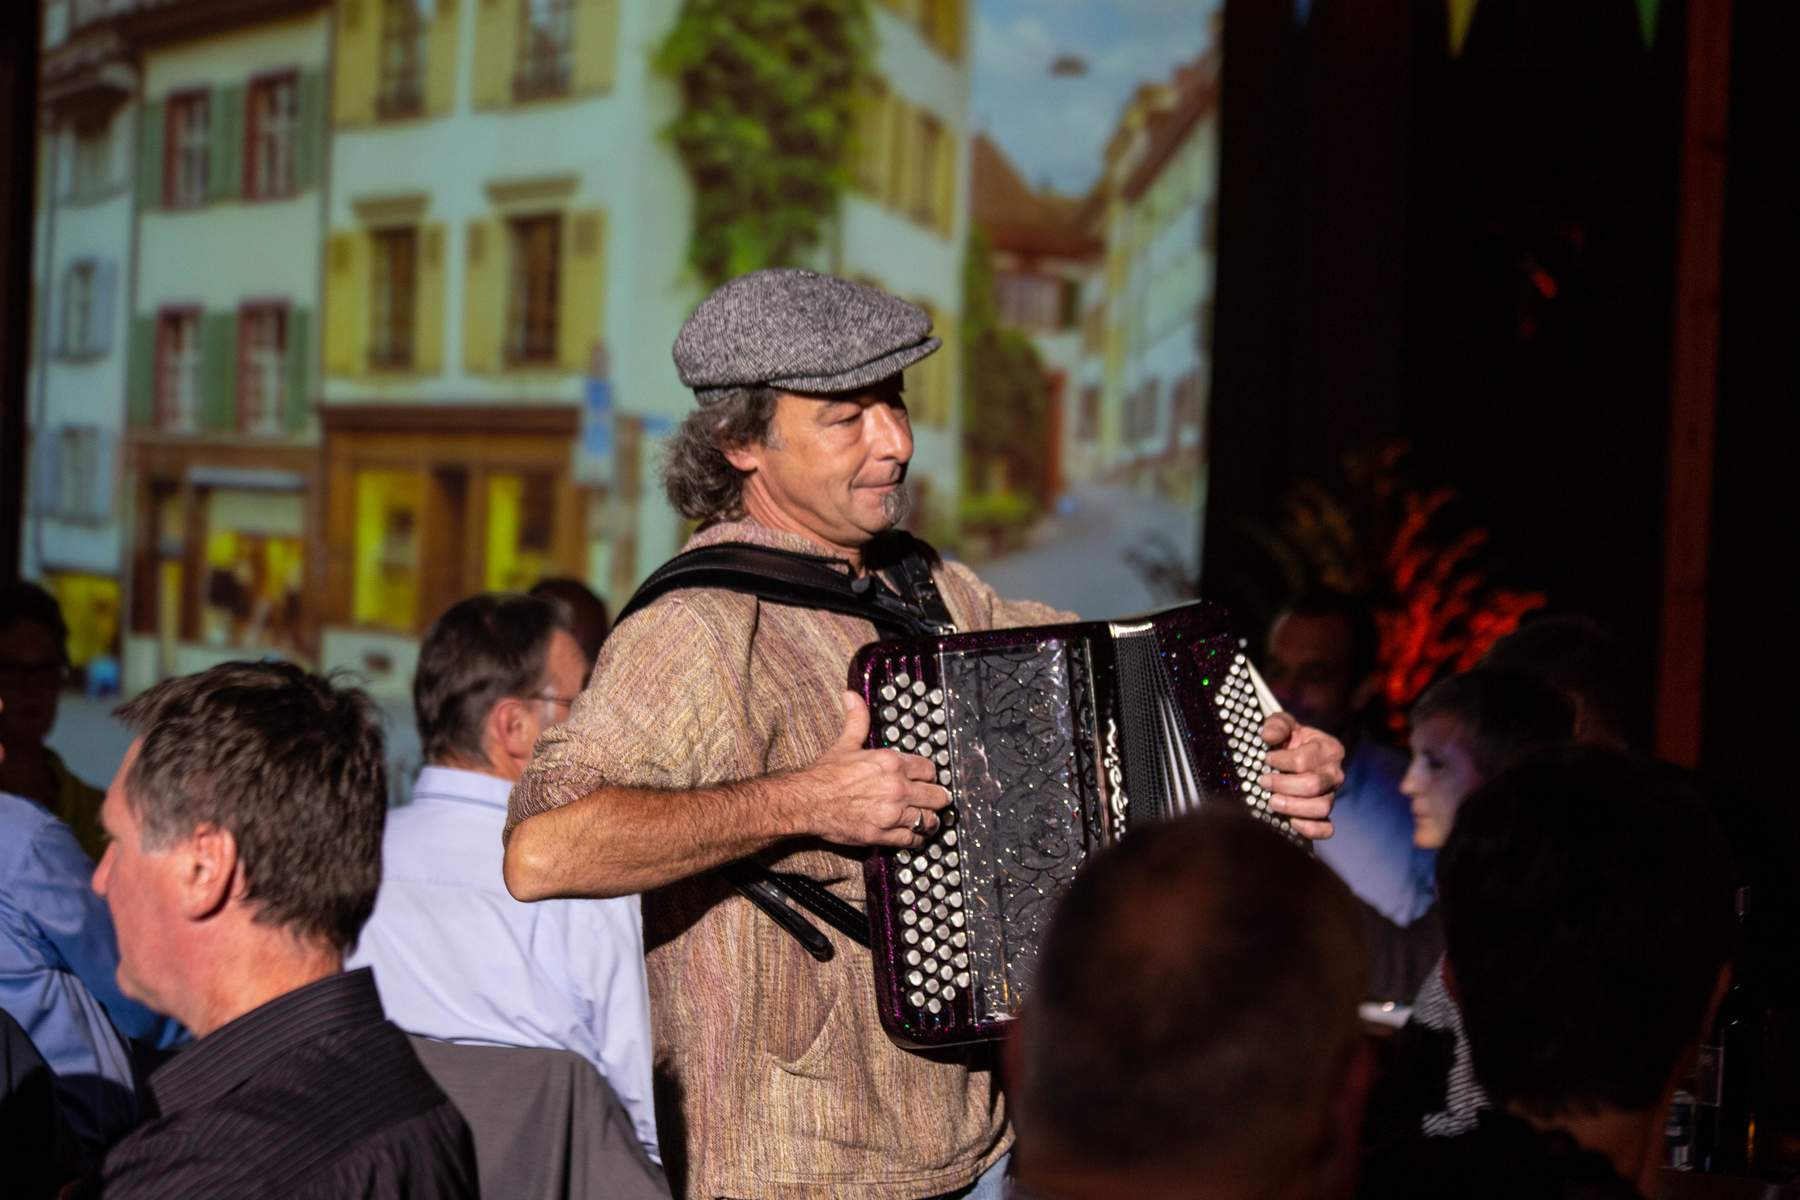 LIVE-TEC | Brasserie Strassenmusik